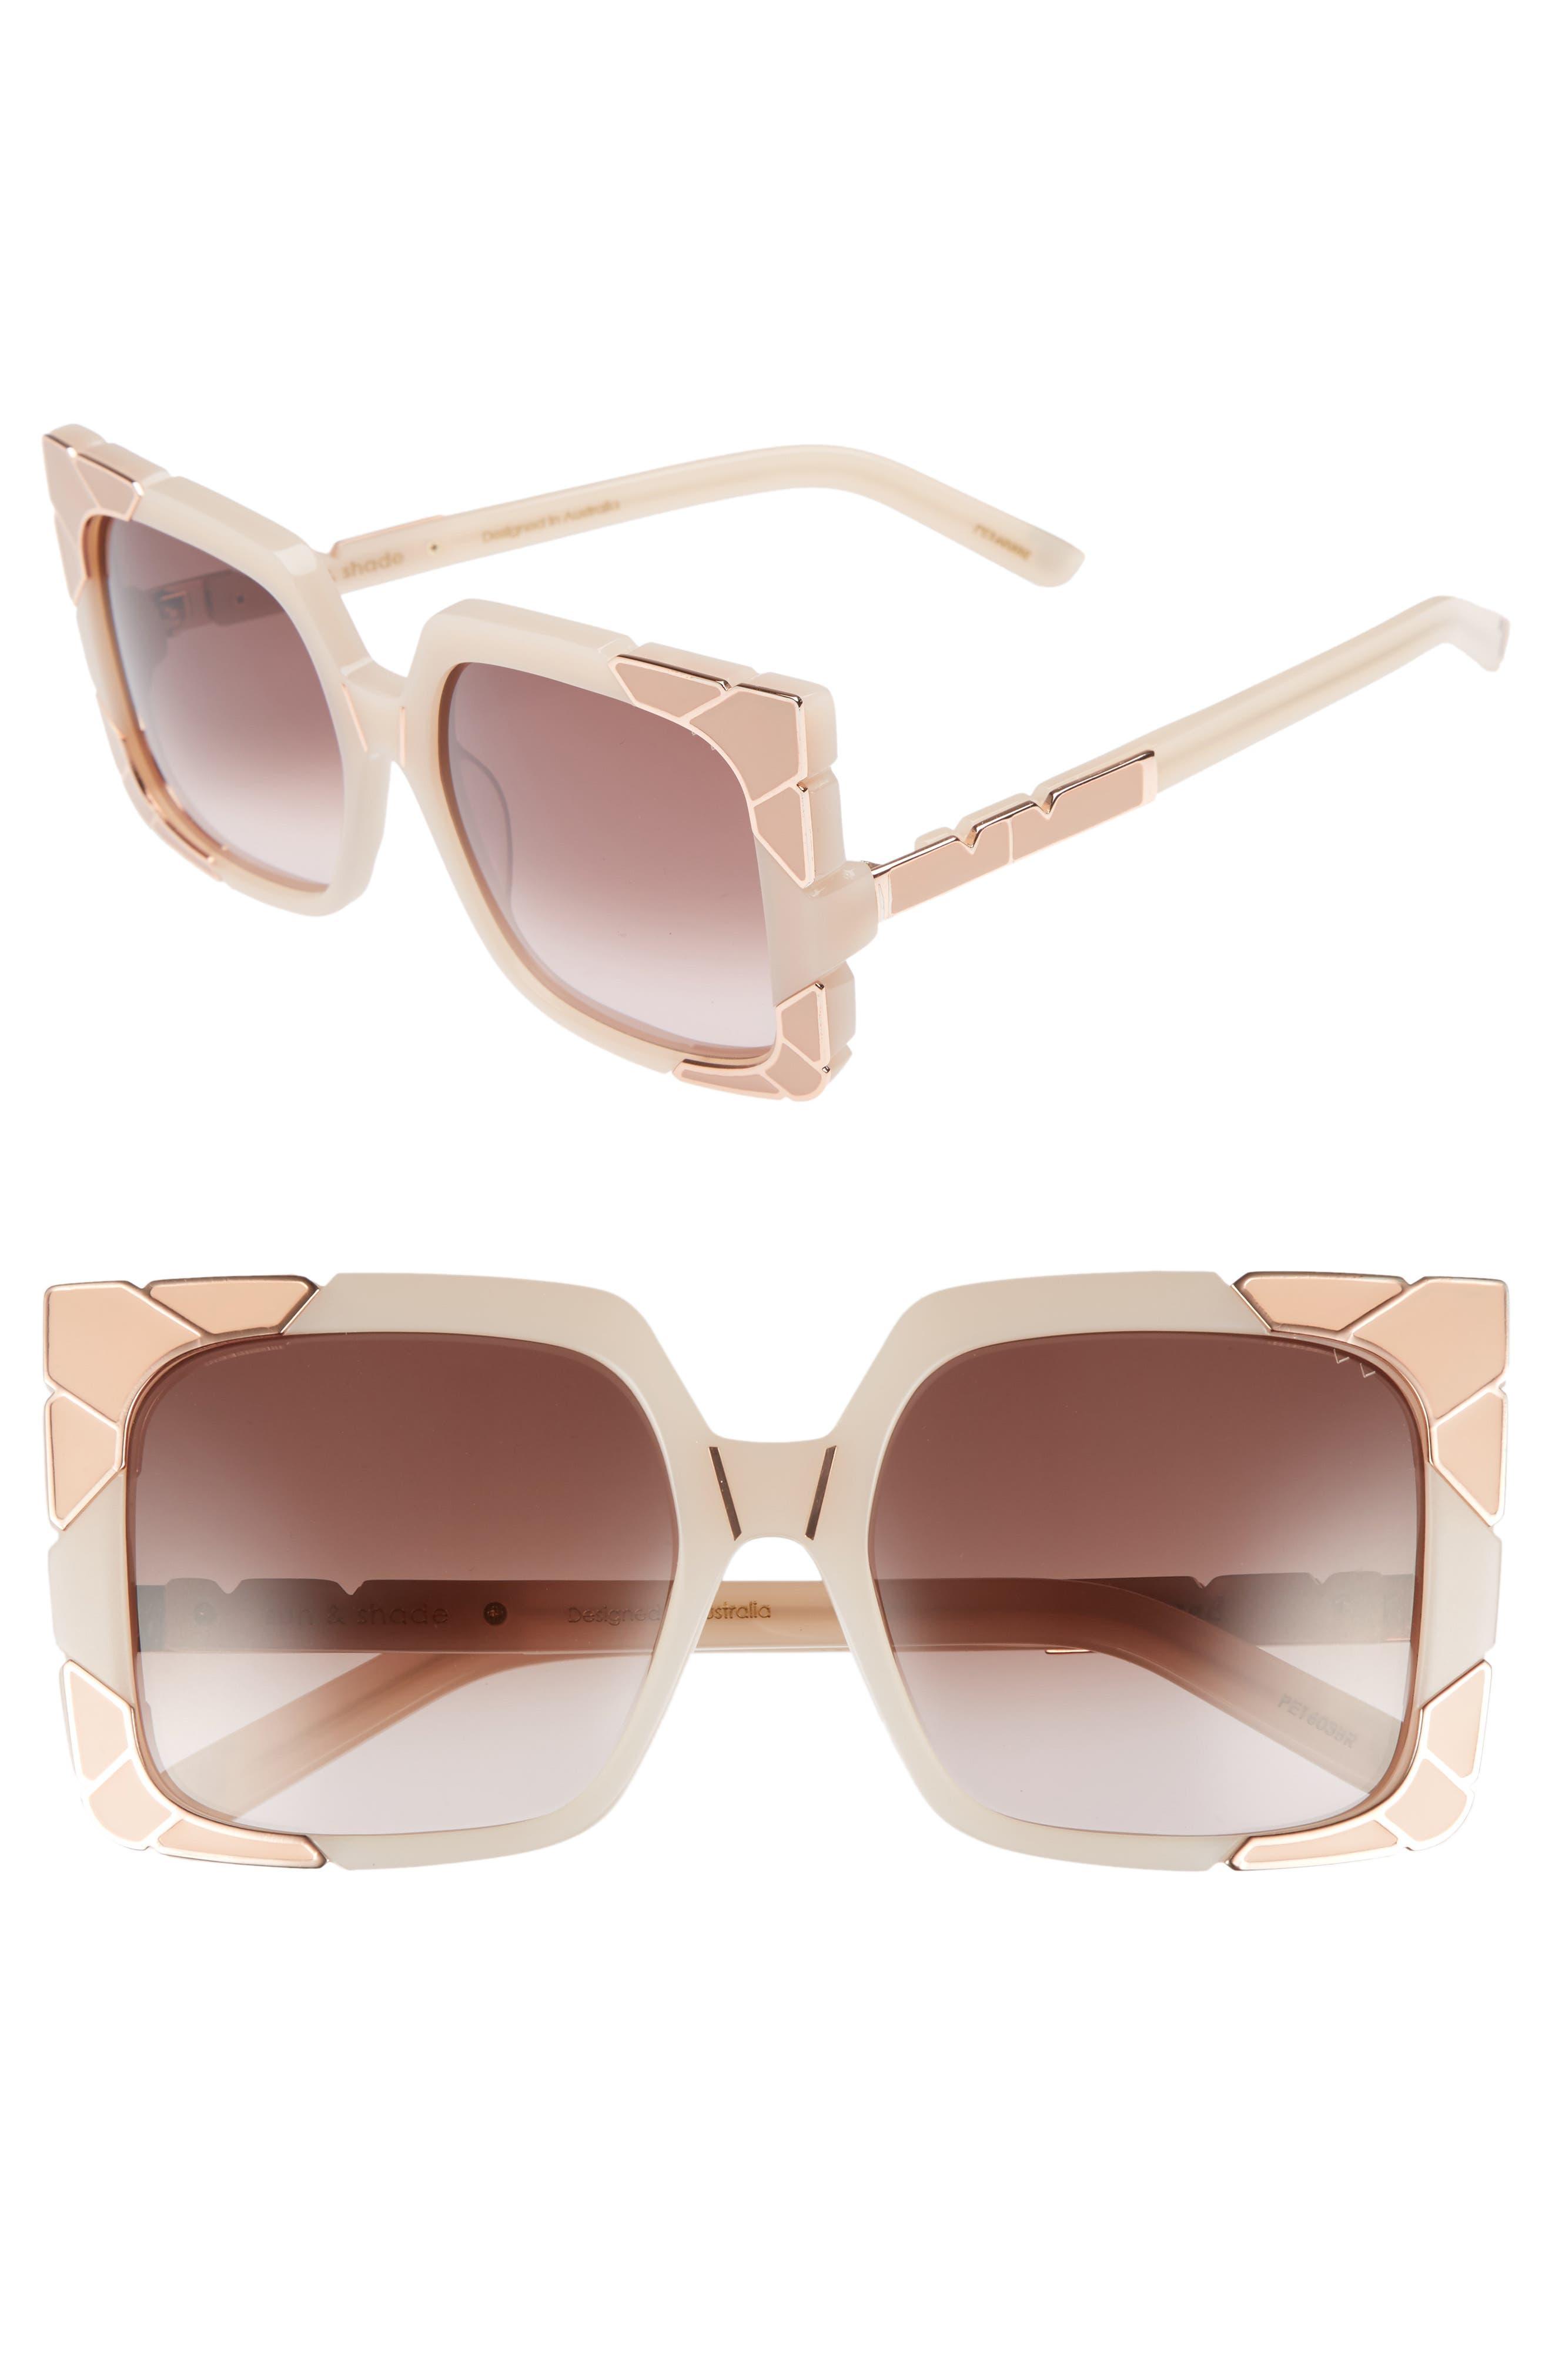 Sun & Shade 55mm Square Retro Sunglasses,                             Main thumbnail 1, color,                             Blush/ Rose Gold/ Brown